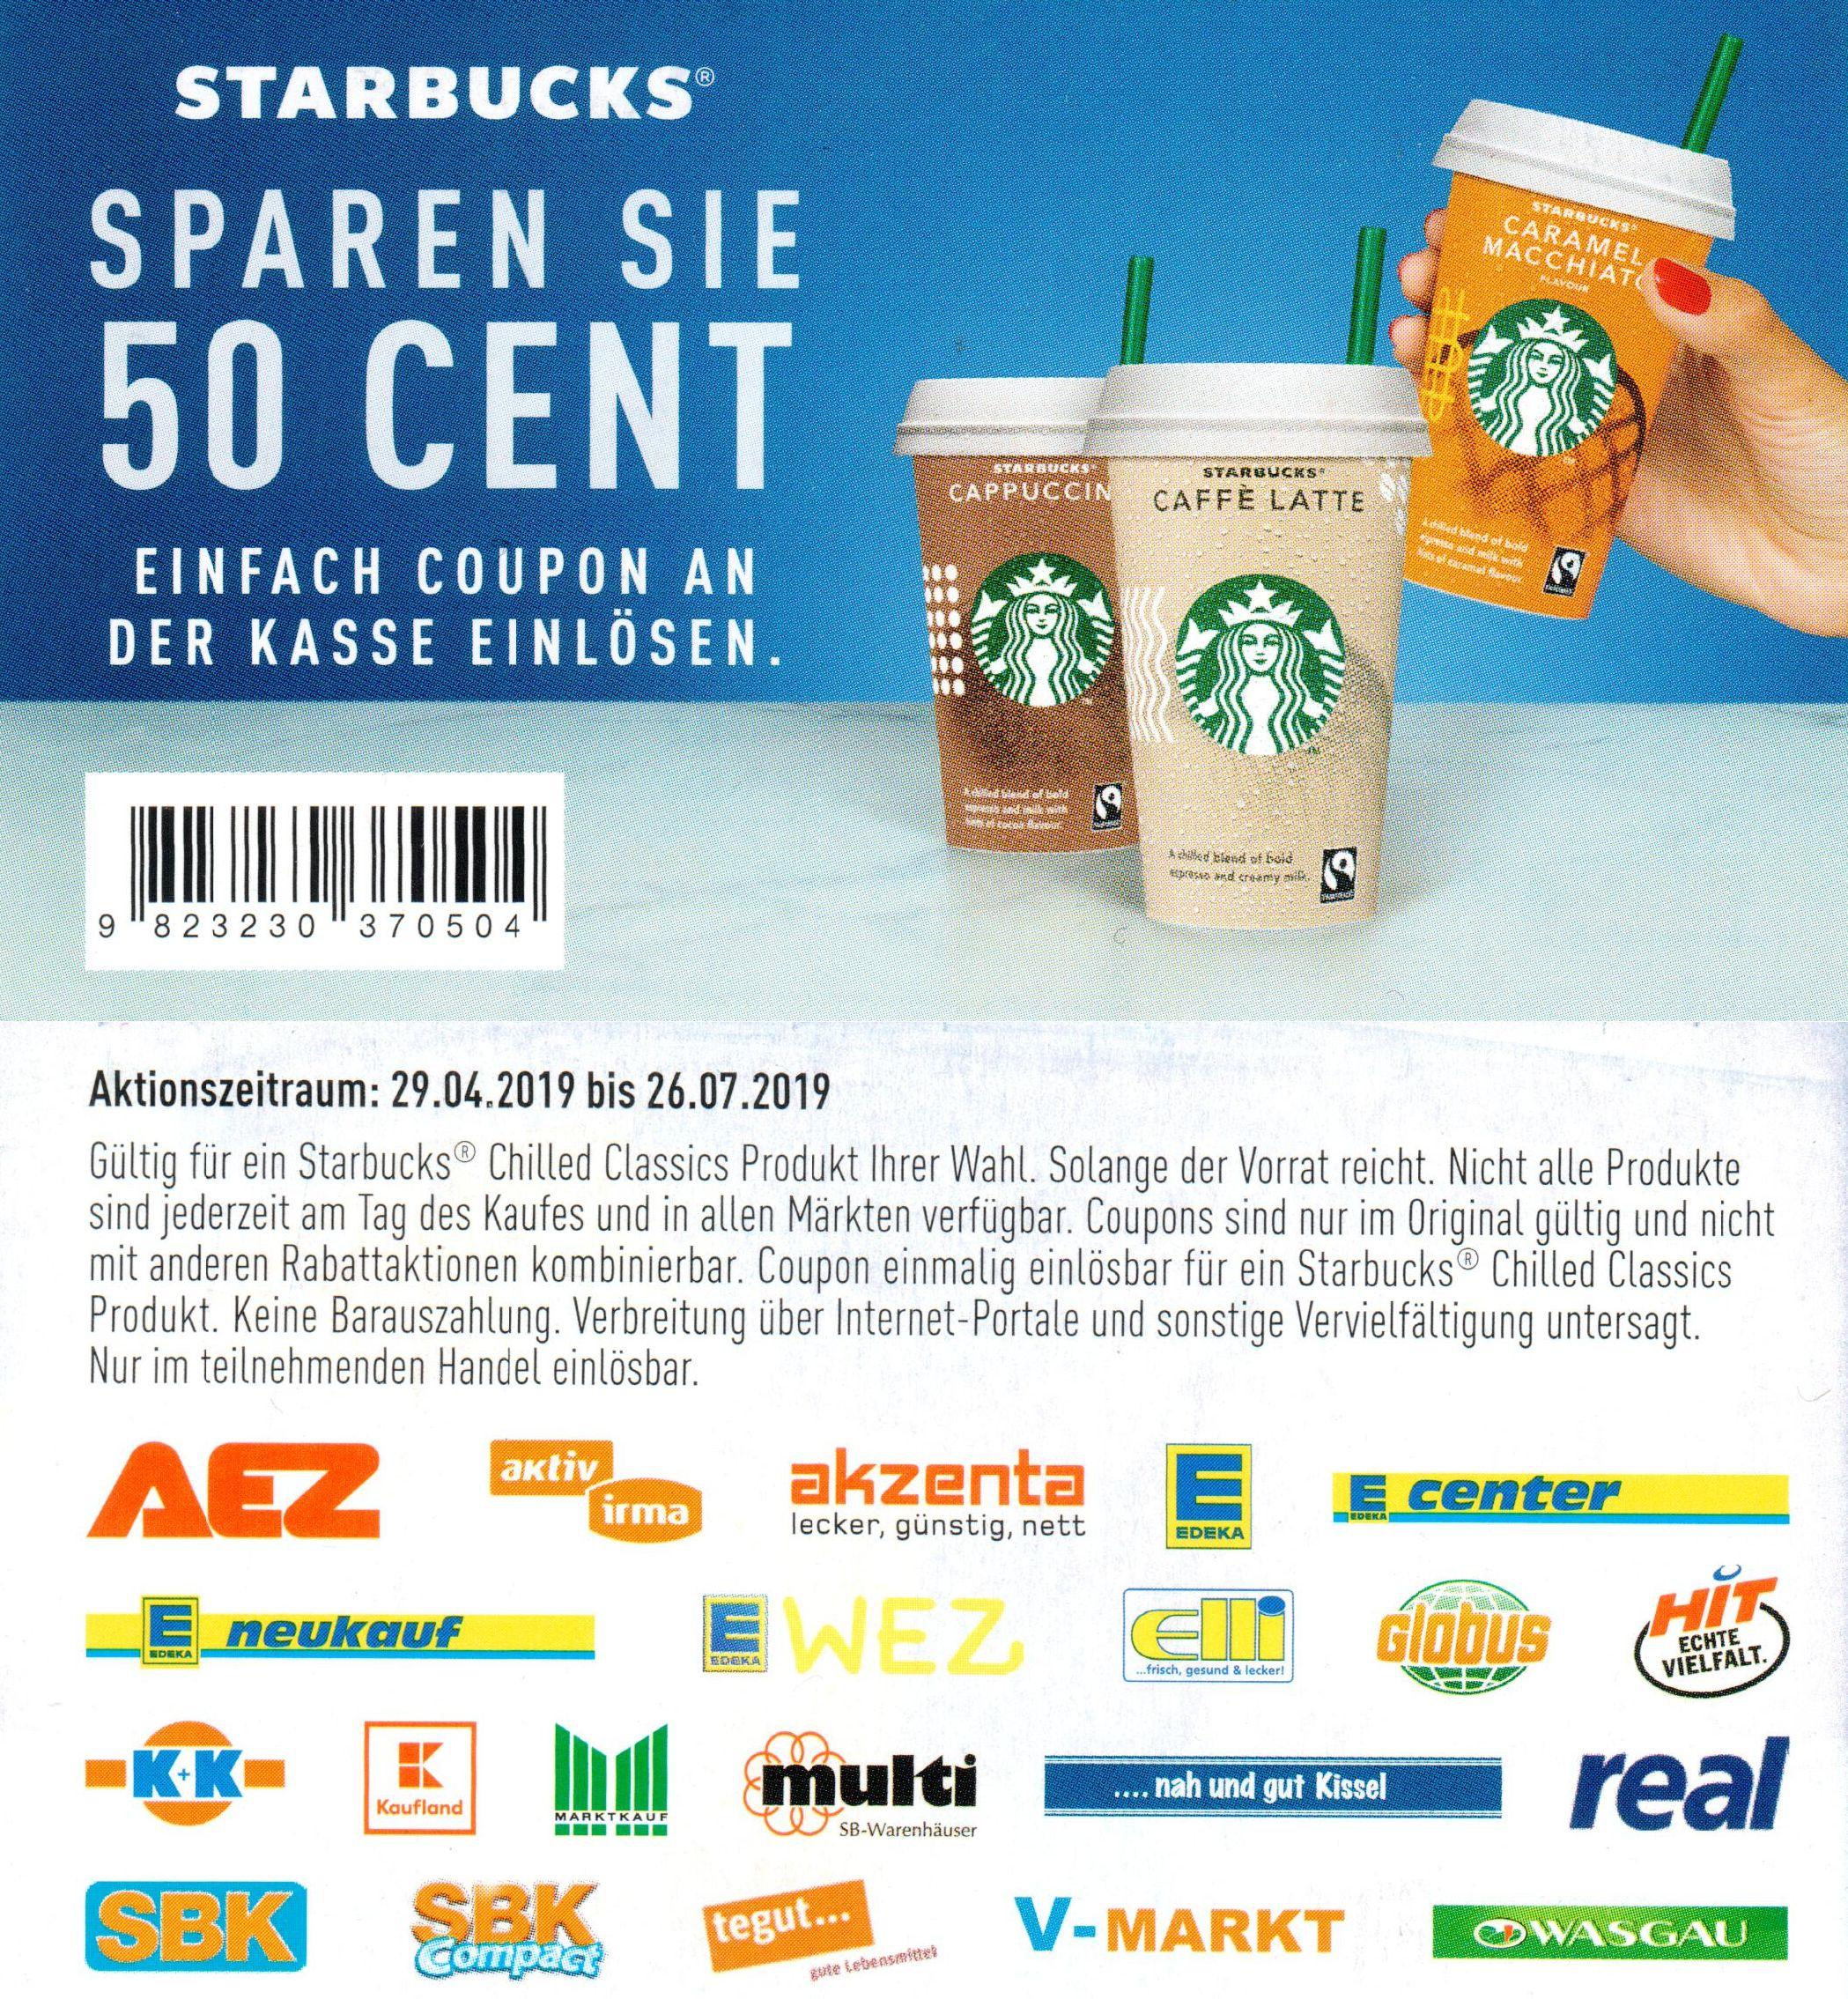 0,50€ Sofort-Rabatt Coupon für Starbucks Chilled Classics bis 26.07.2019